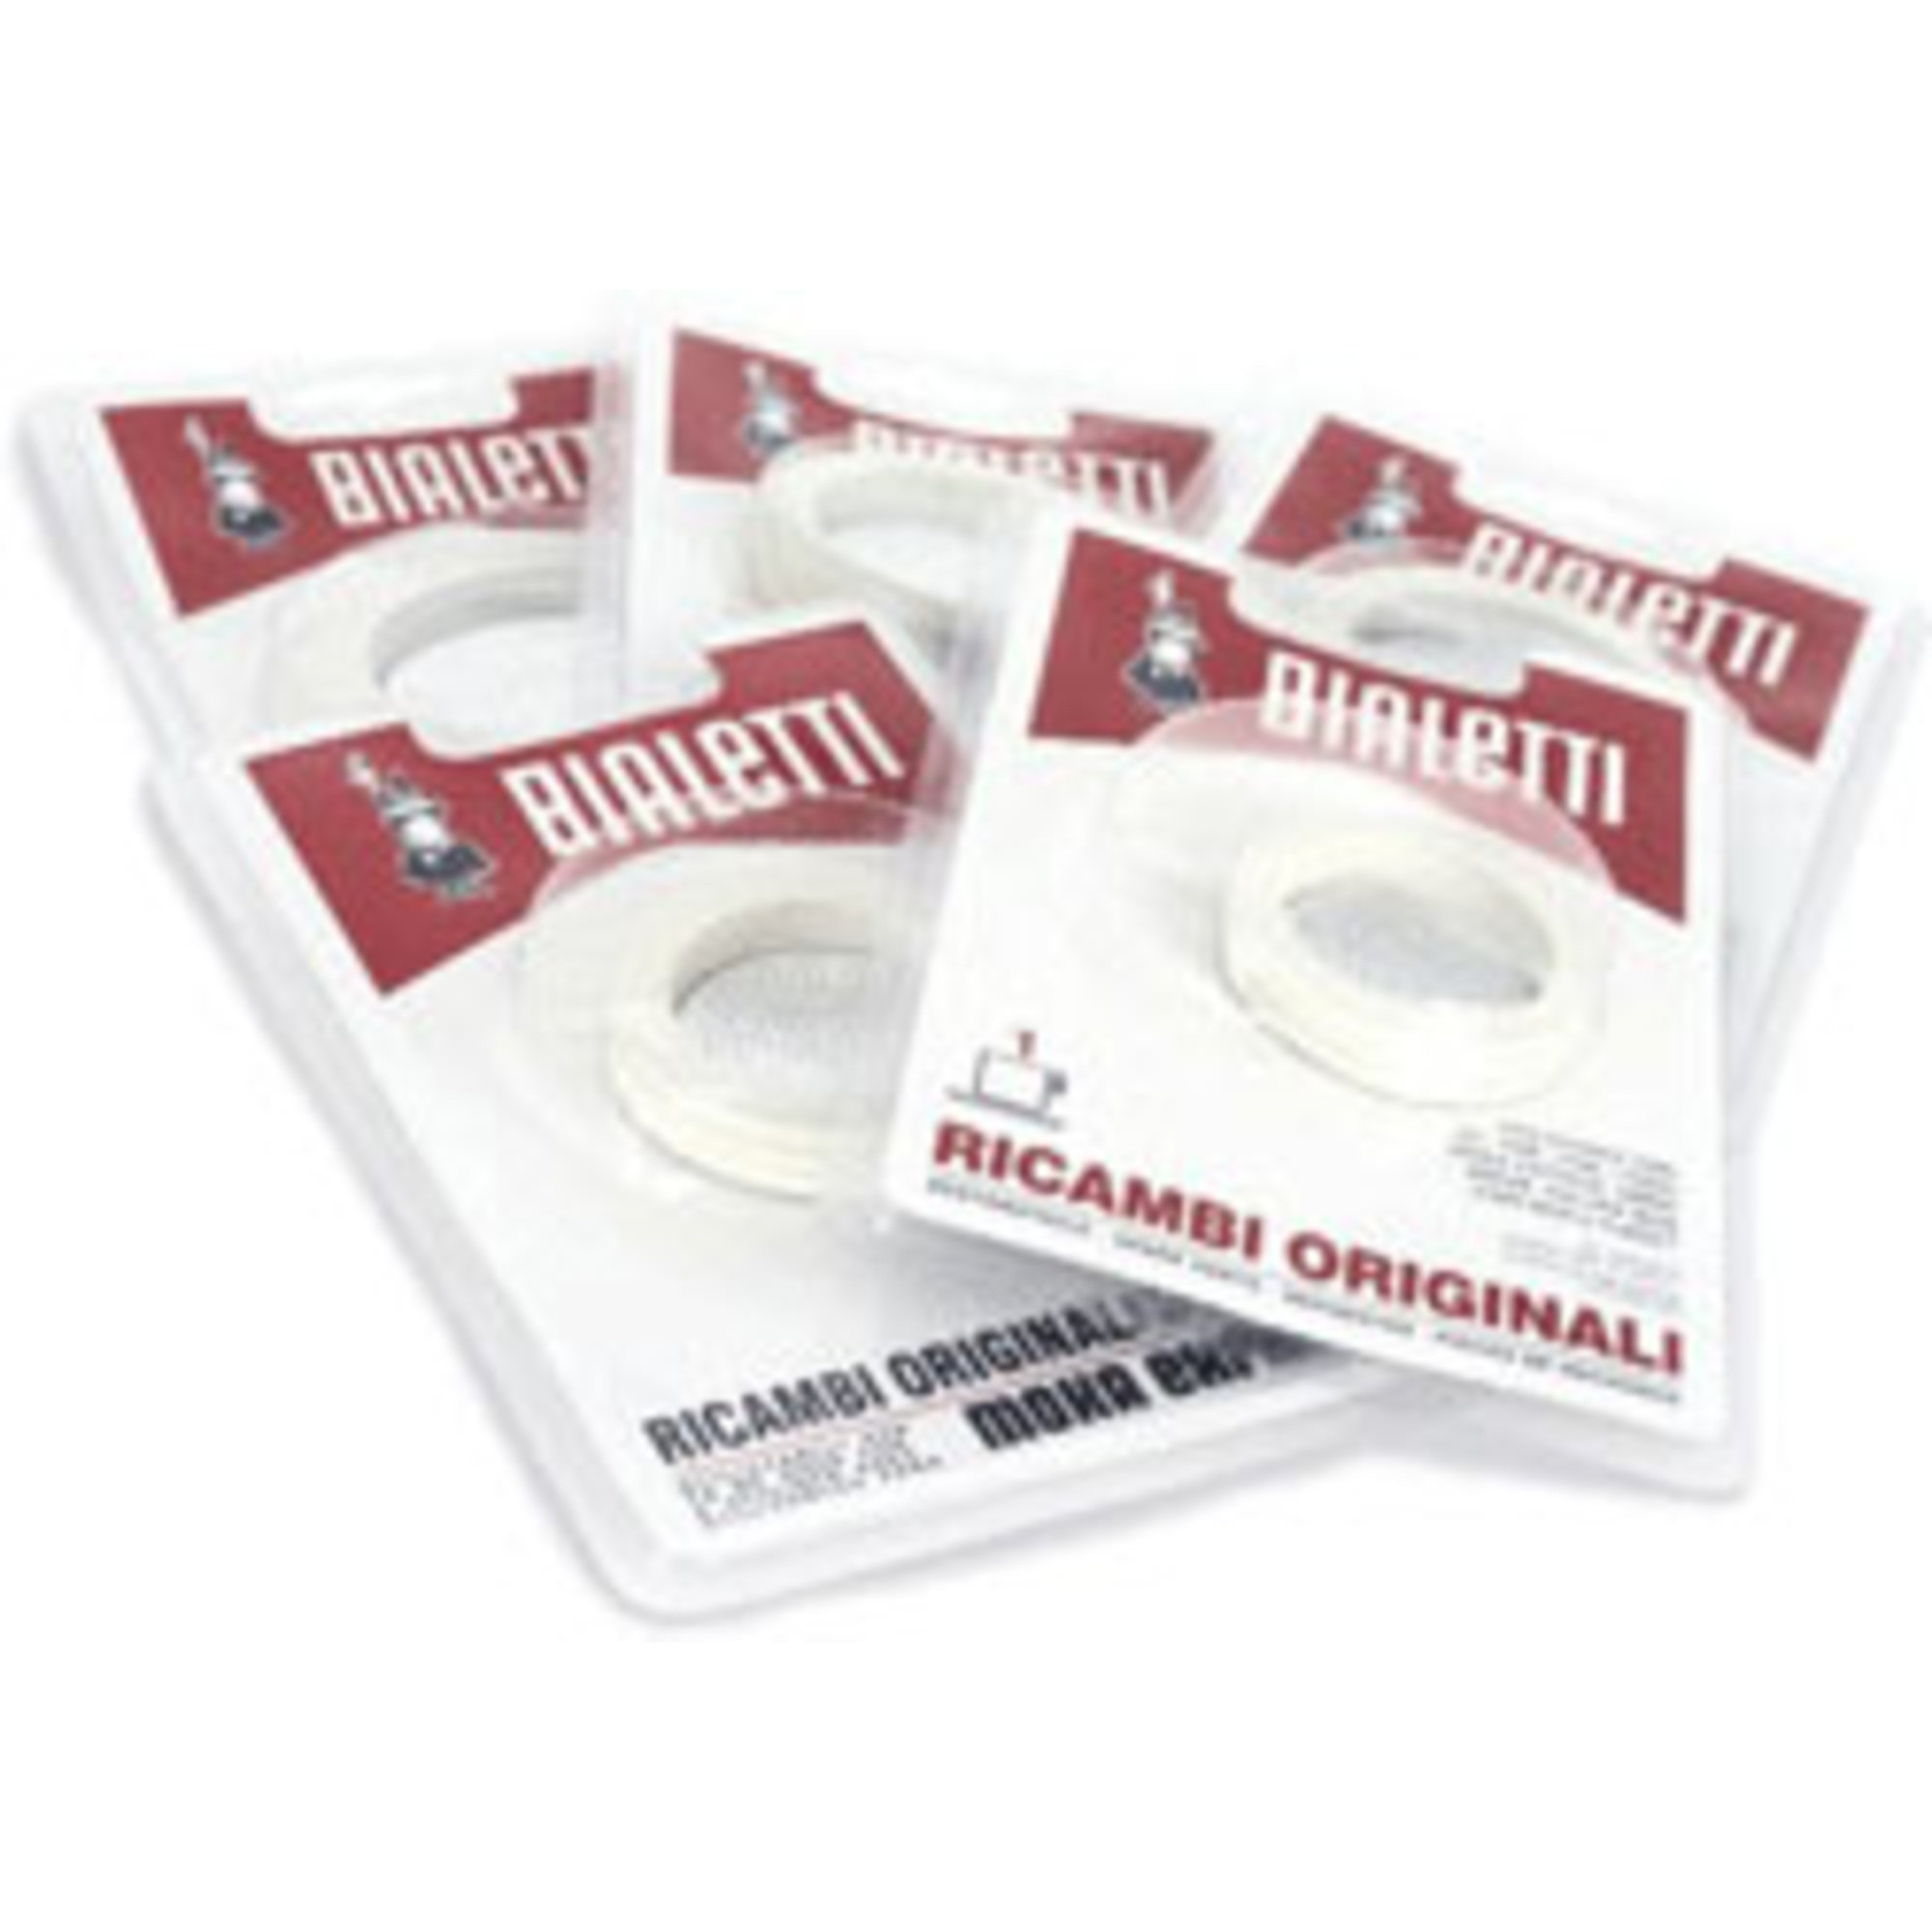 Bialetti Packningsset till Mokabryggare Aluminium 1 Koppars